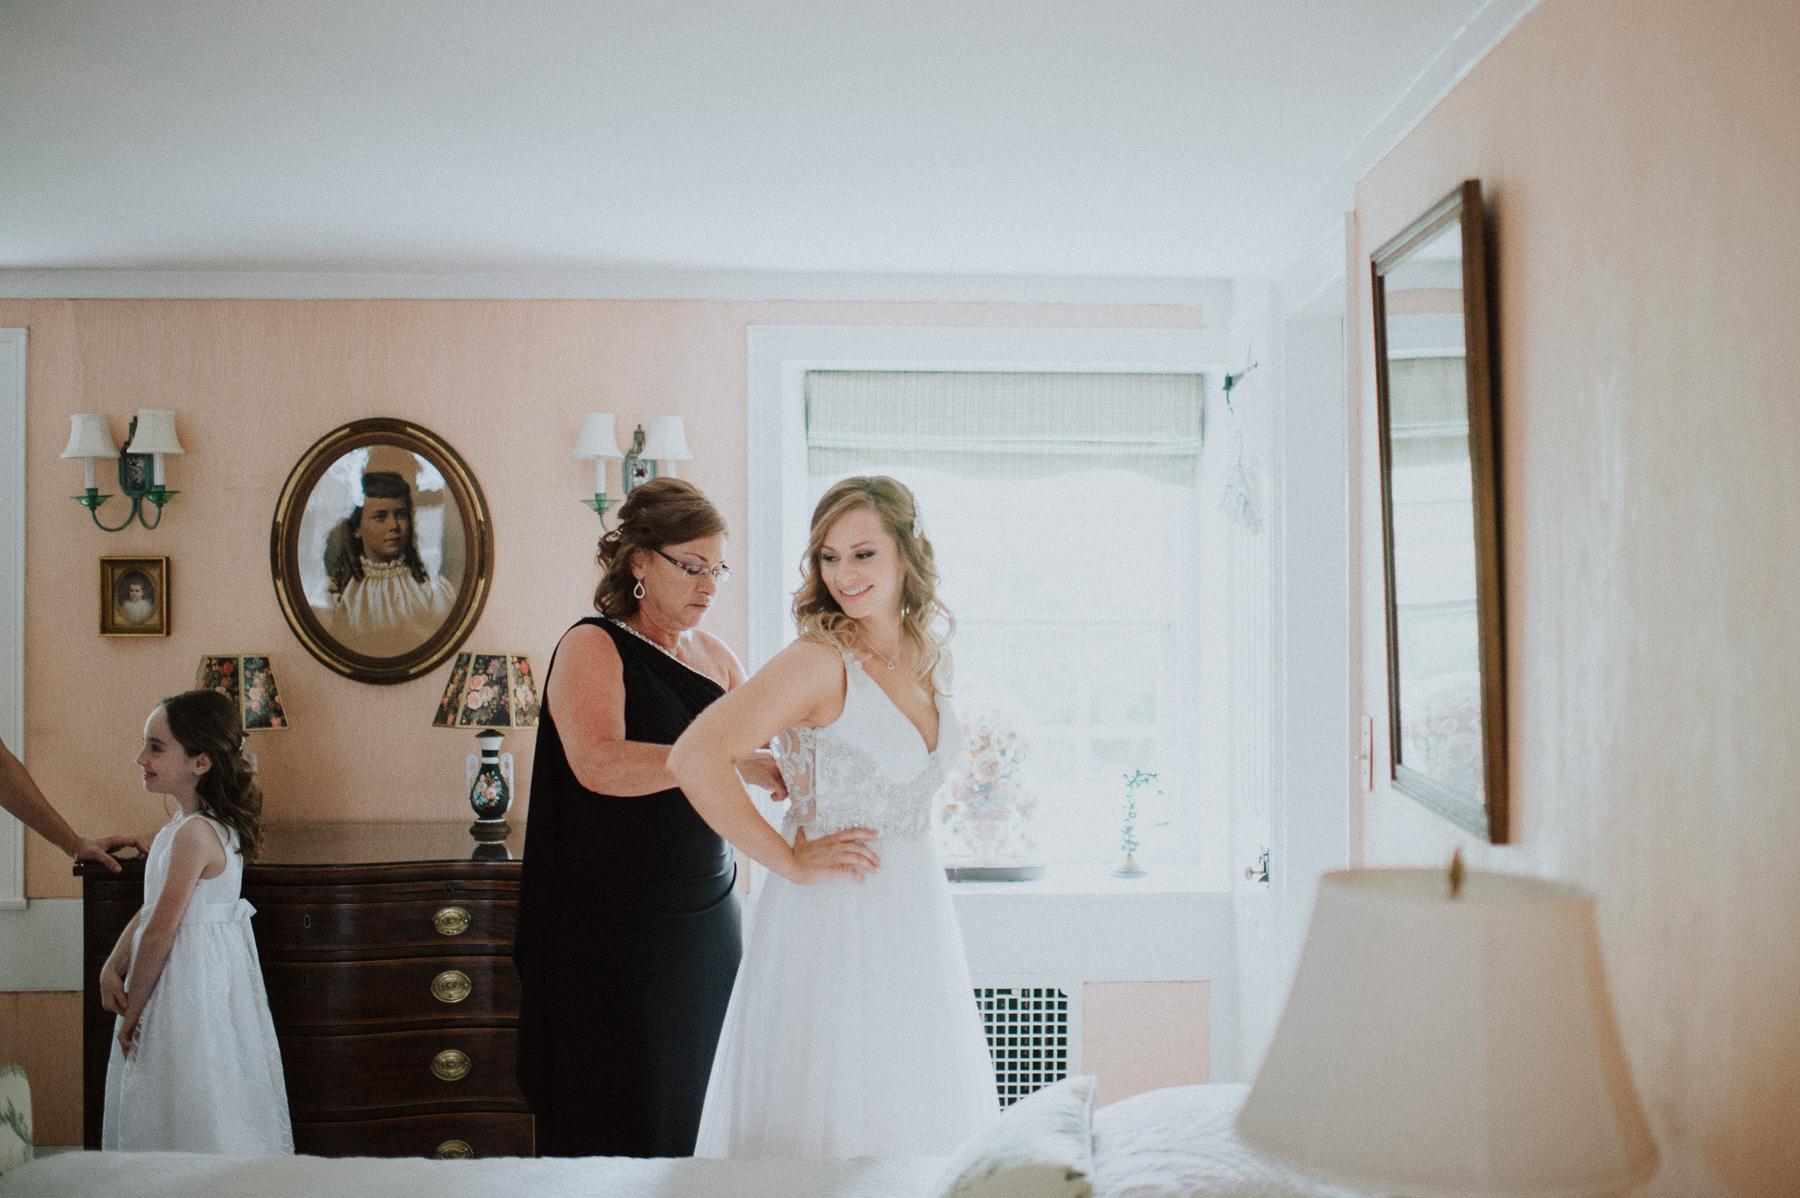 appleford-estate-wedding-photography-17.jpg